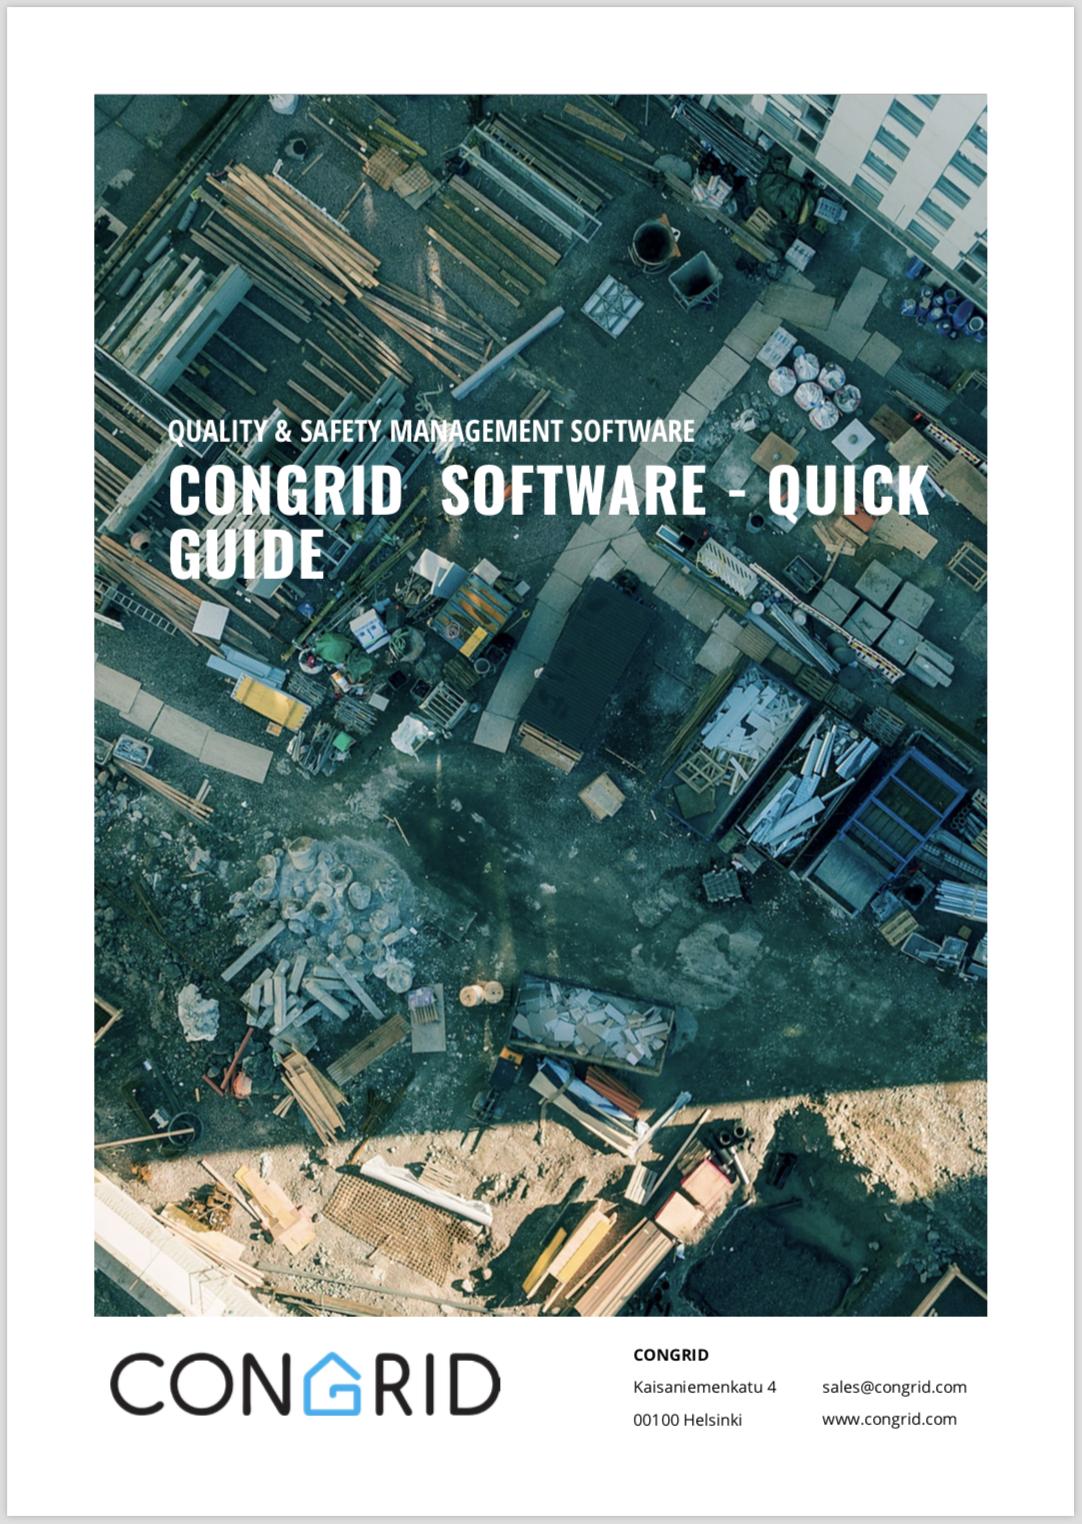 Congrid_EN_guide_2018.png